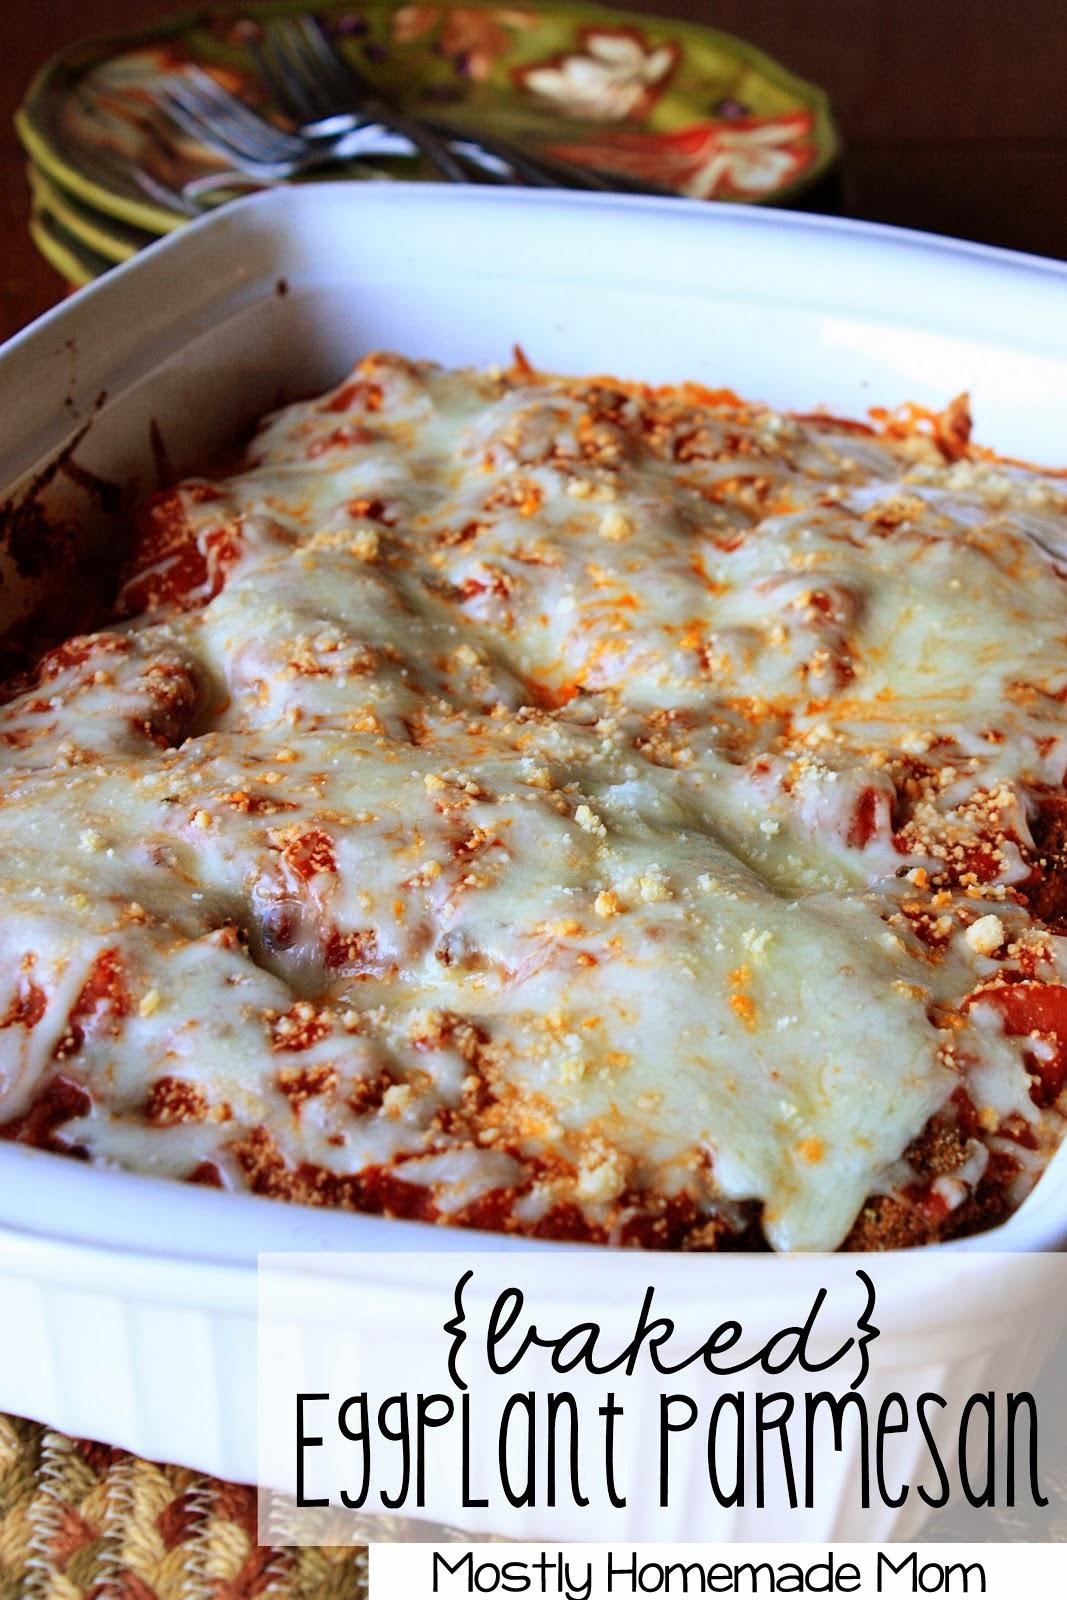 Baked Eggplant Parmesan | Mostly Homemade Mom